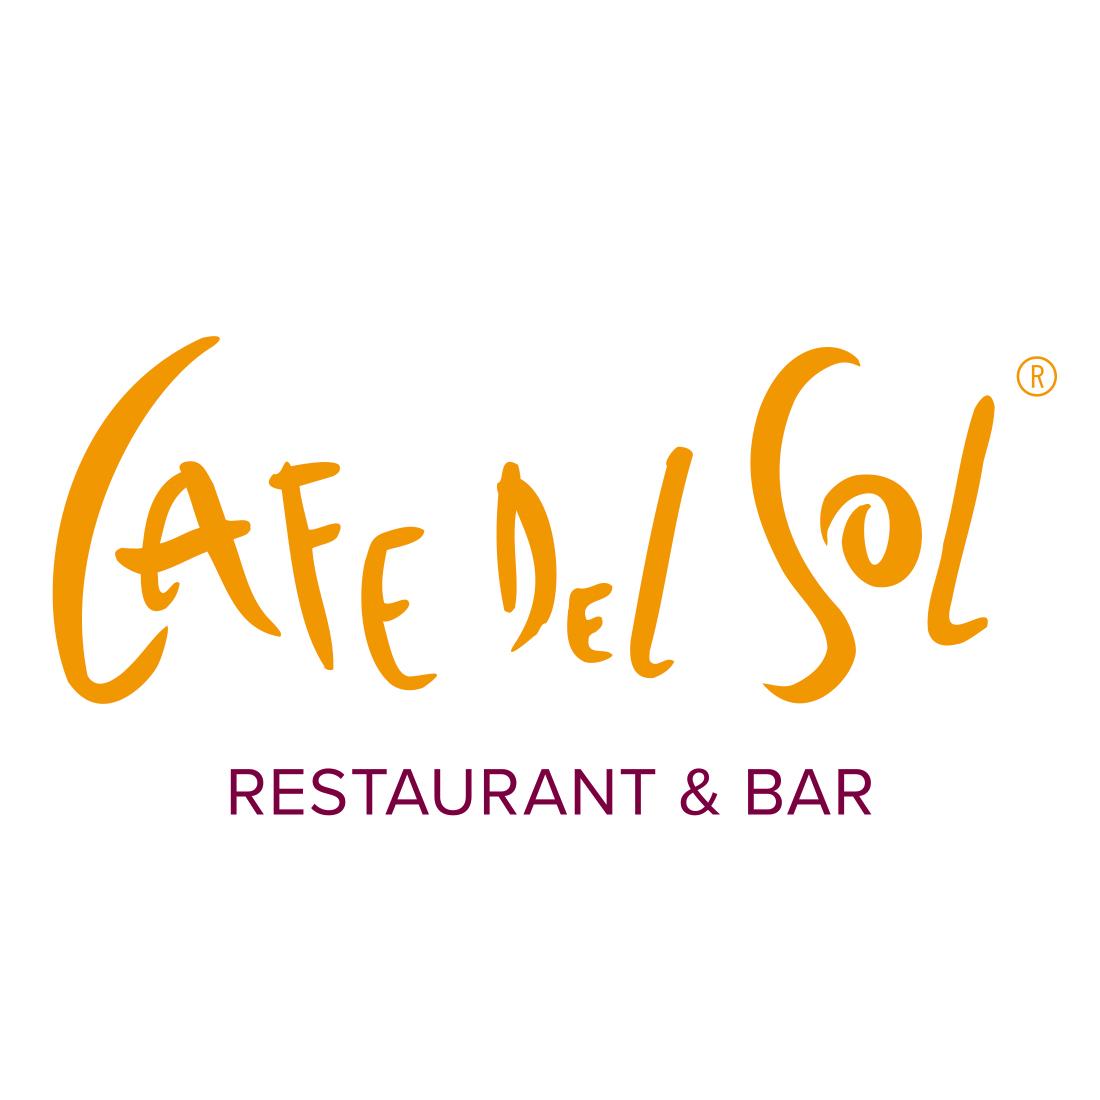 Logo Cafe del Sol